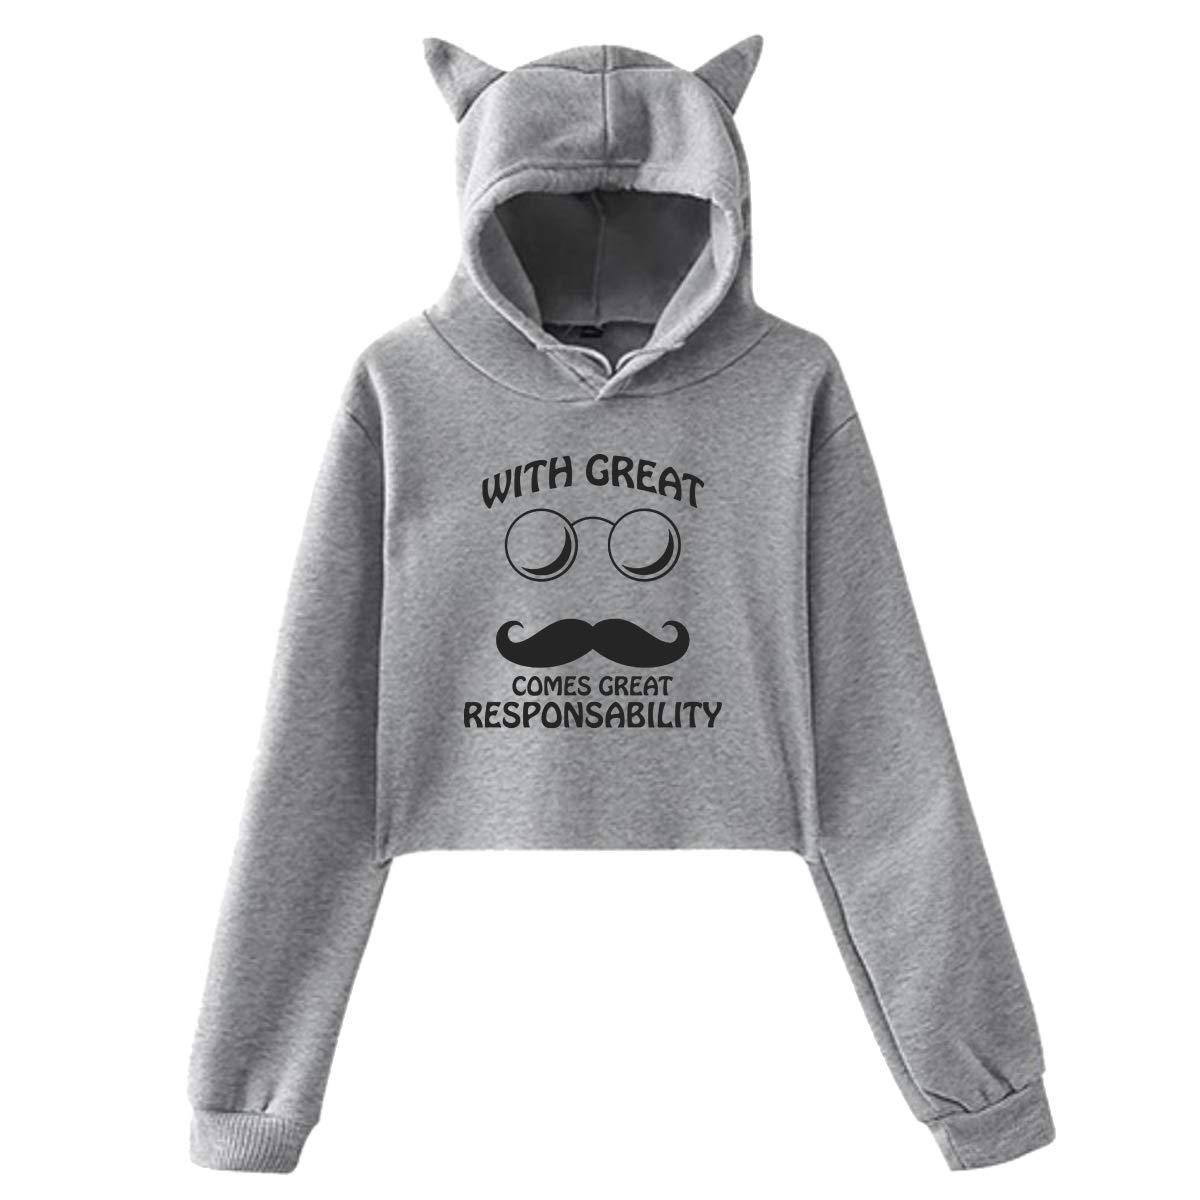 Womens Long Sleeve Crop Top Hoodies Great Mustache Cat Ear Lumbar Hoodie Pullover Sweater